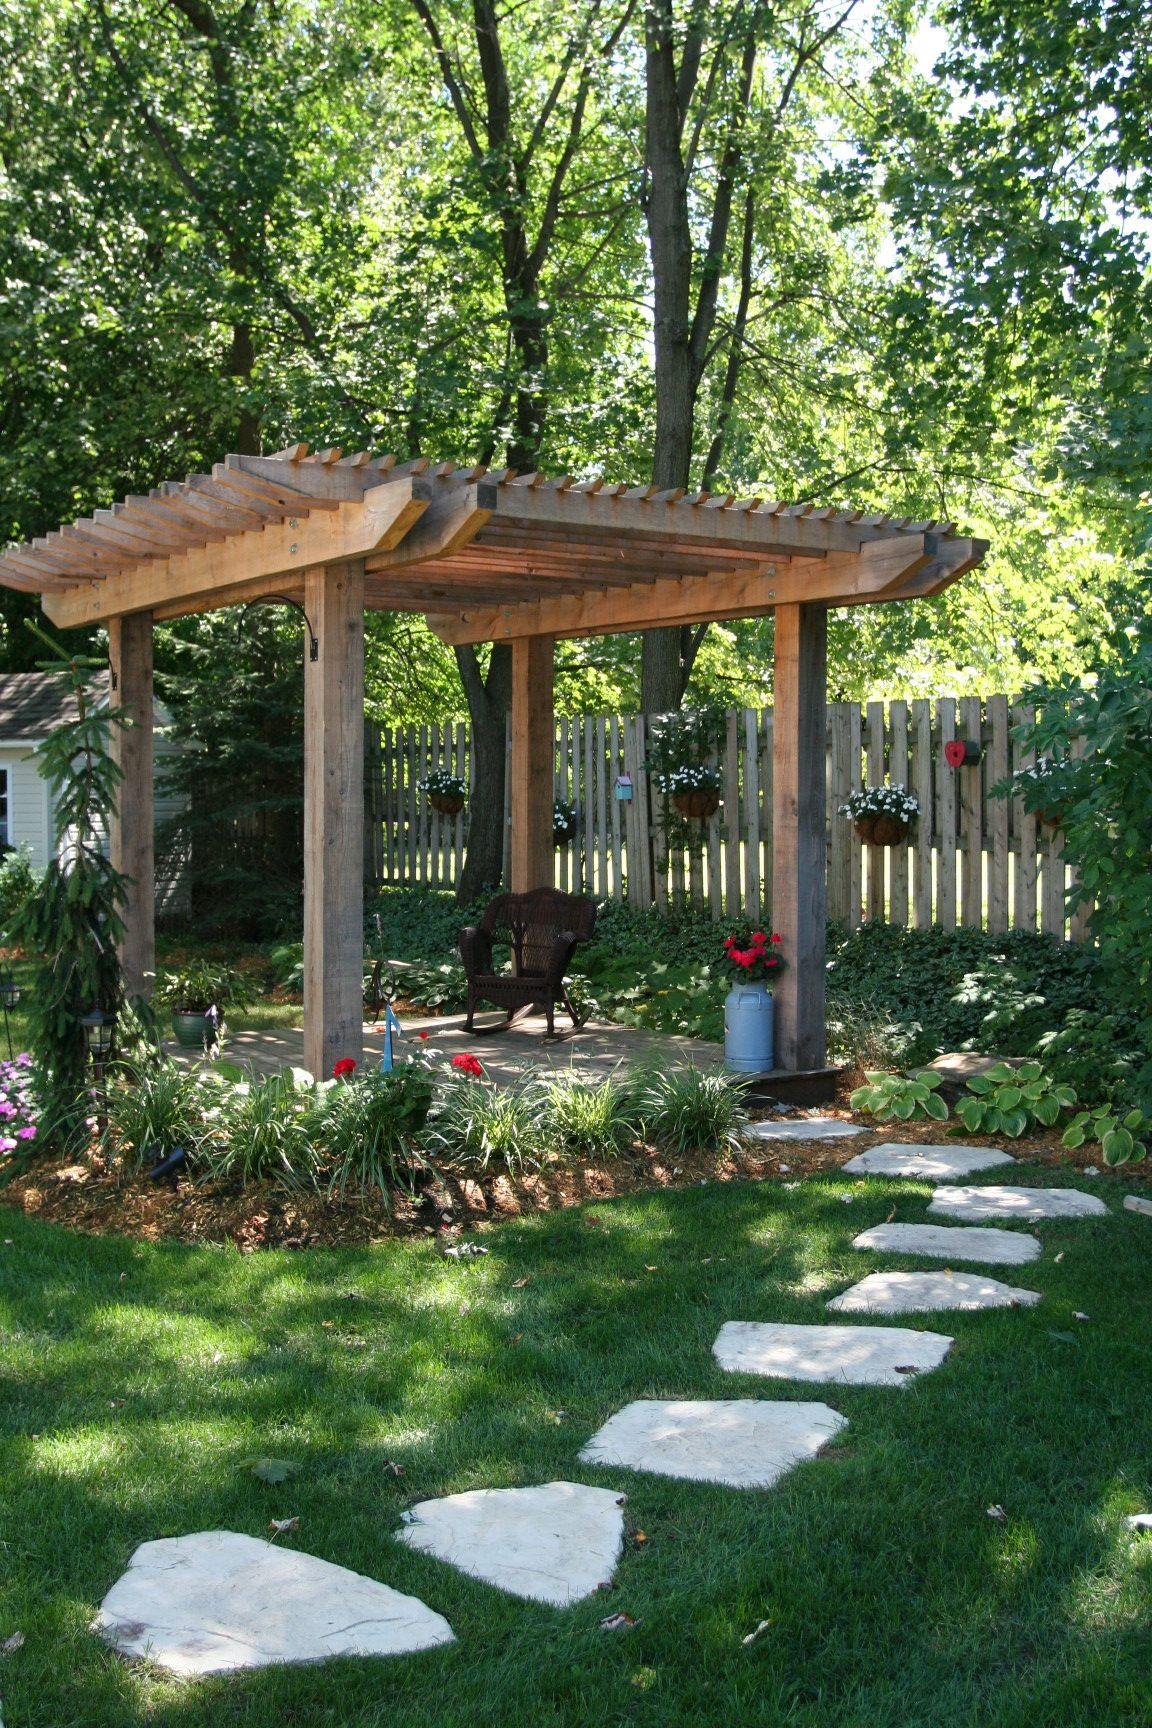 Merveilleux Image Result For Small Japanese Garden Pergola